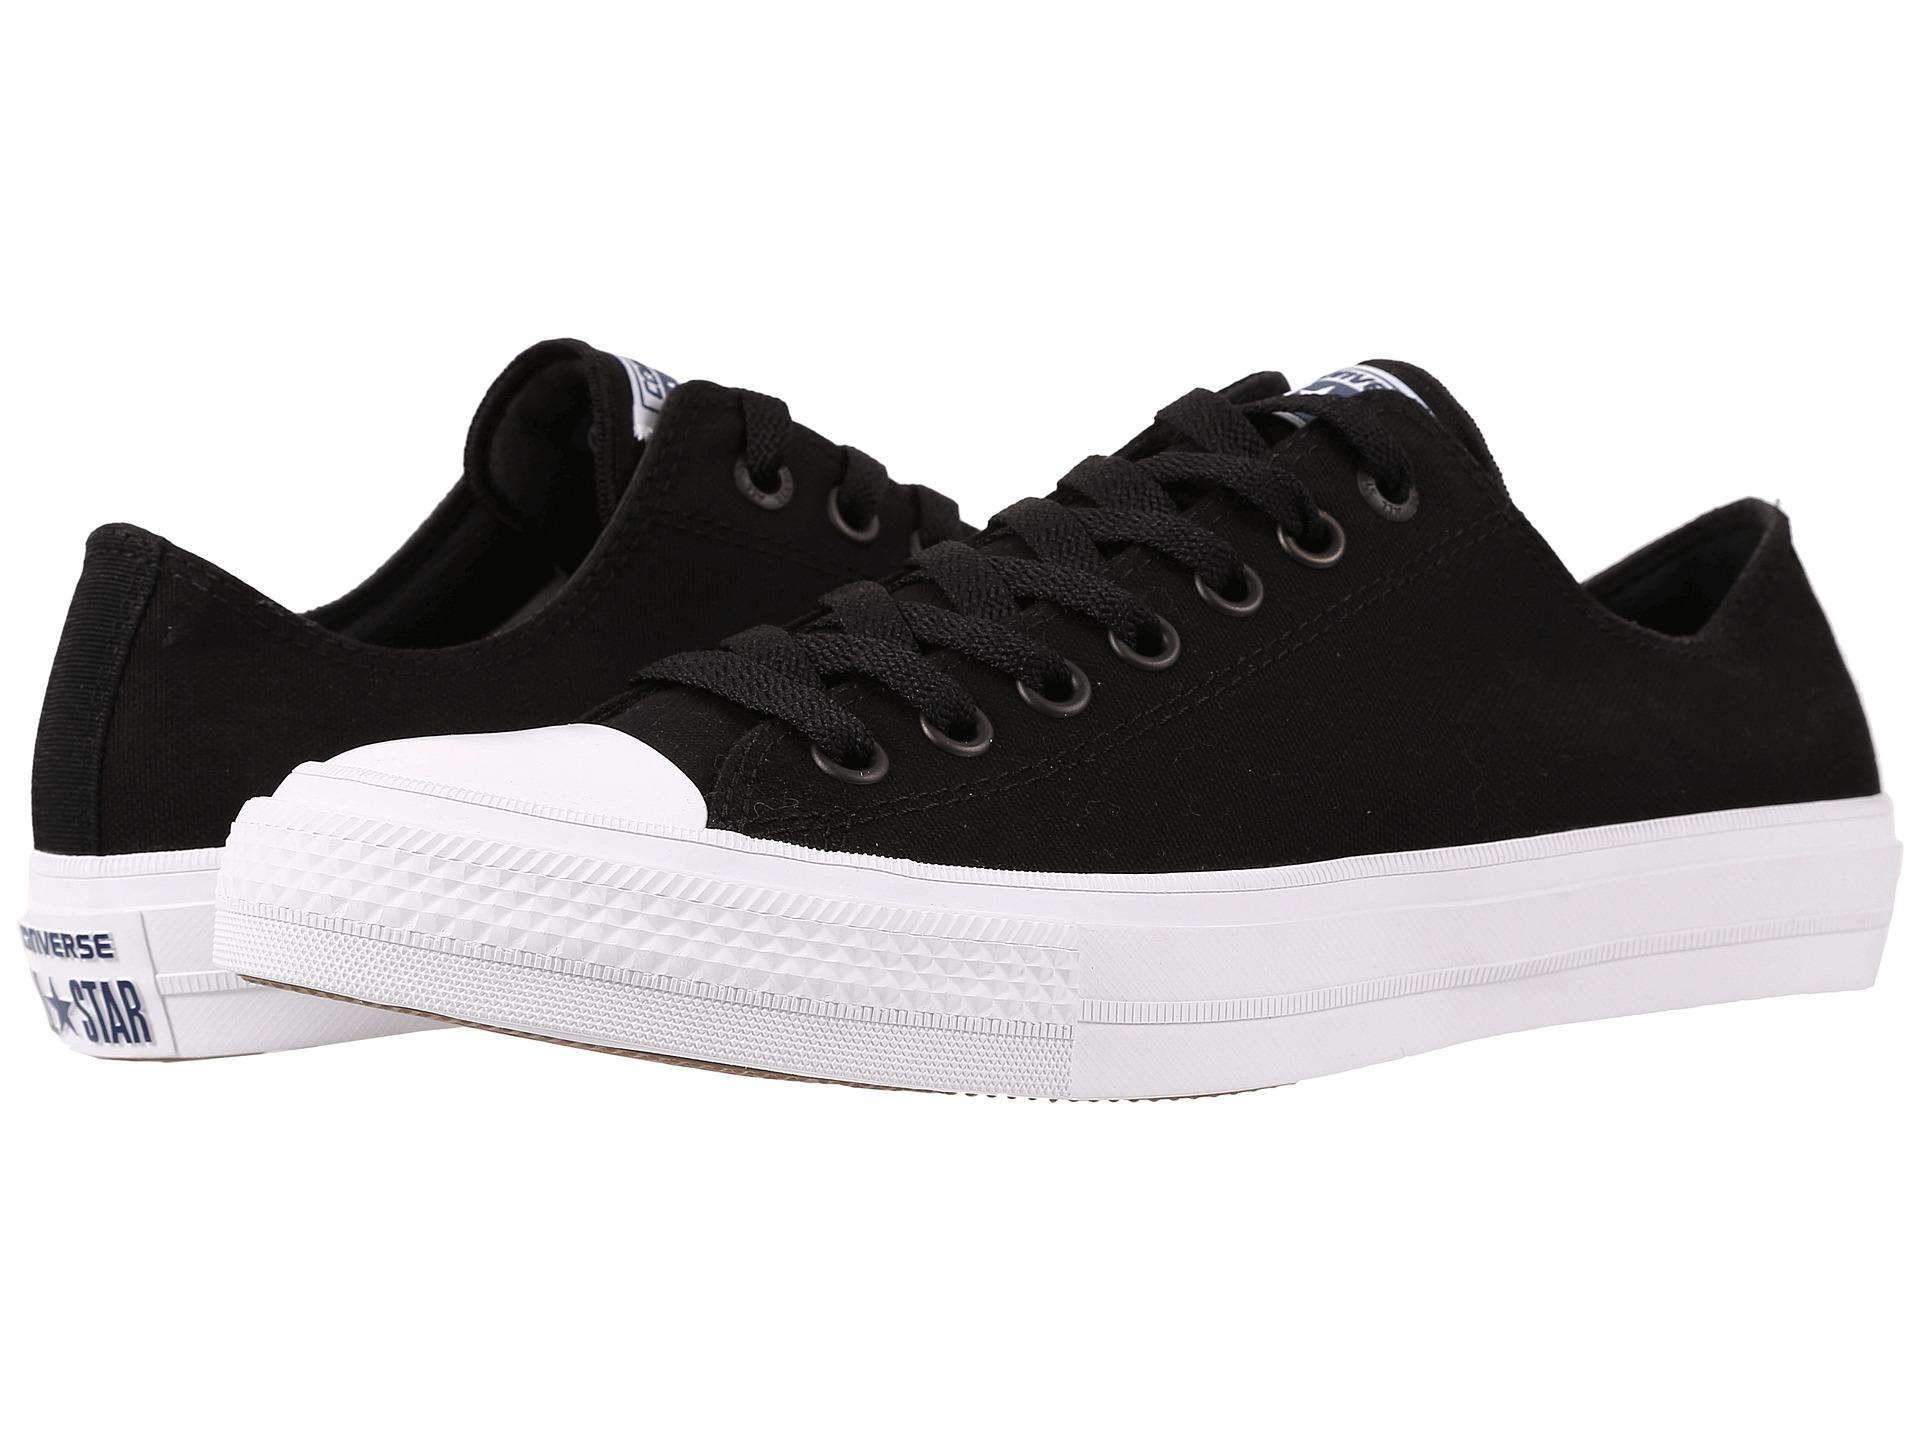 Converse All Star High Top Black Shoe White Logo